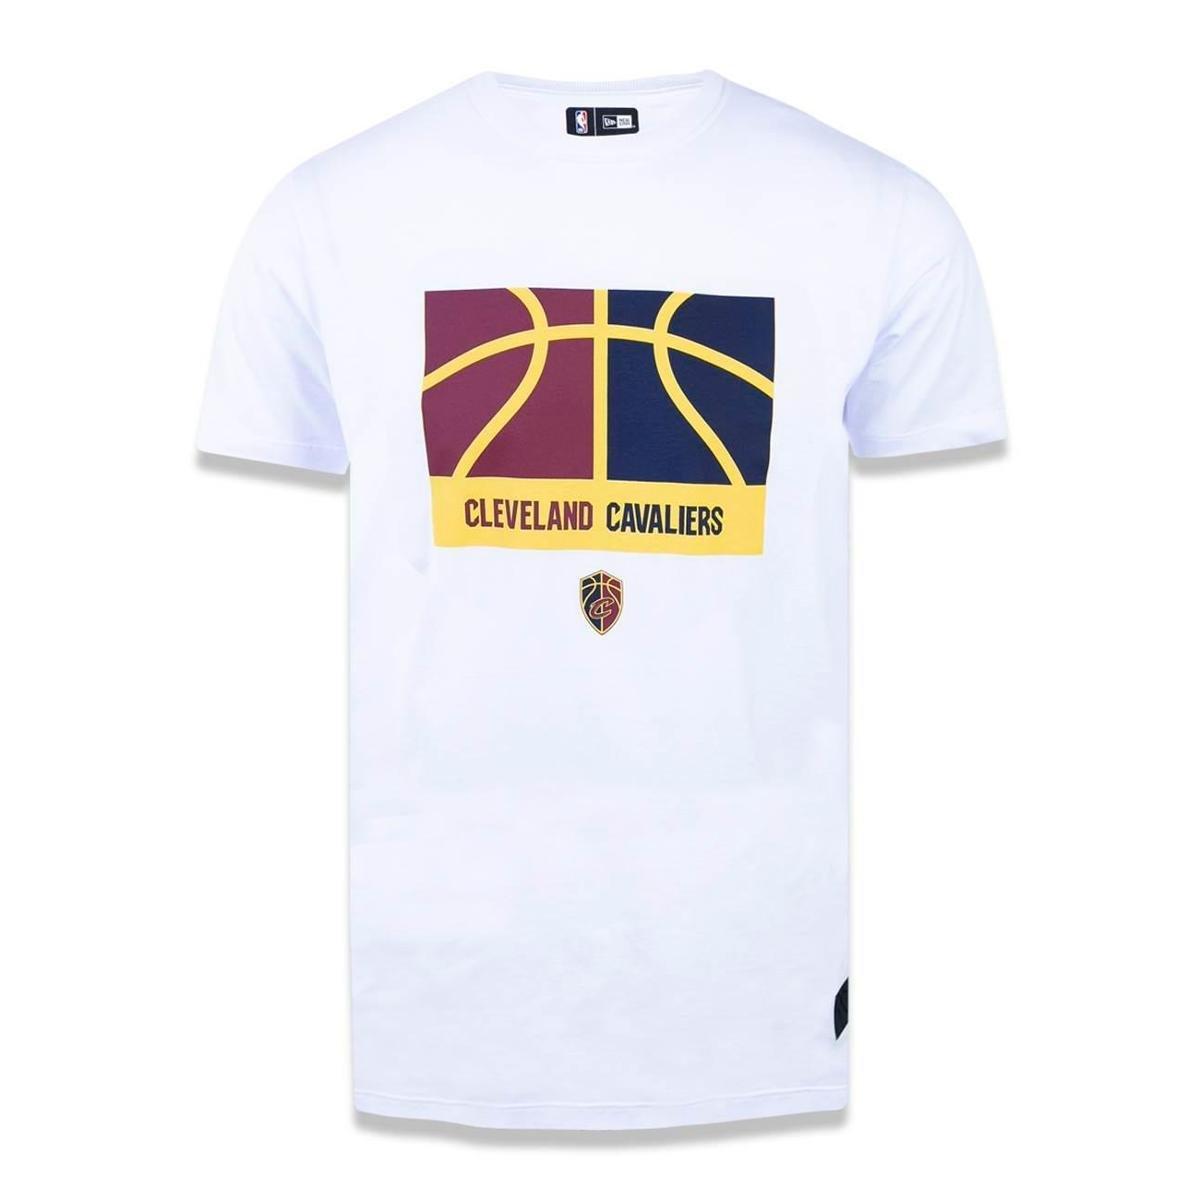 34951a3ae4fe7 Camiseta Cleveland Cavaliers NBA New Era Masculina - Branco - Compre Agora